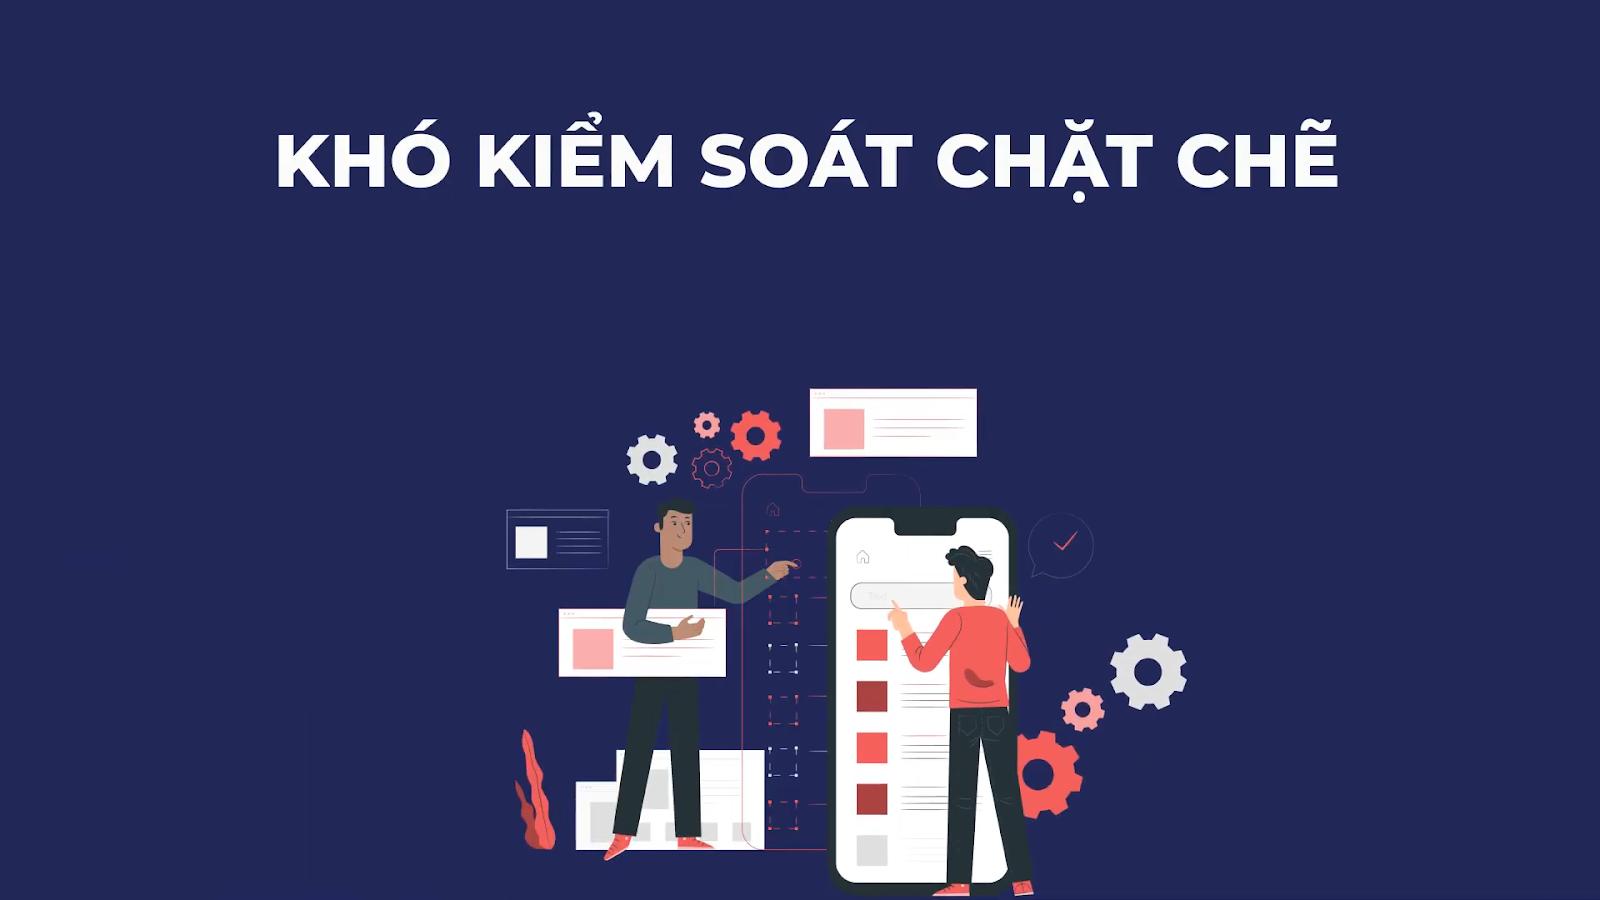 mot-nhuoc-diem-lon-cua-marketing-bat-dong-san-thue-ngoai-do-la-kho-kiem-soat-chat-che